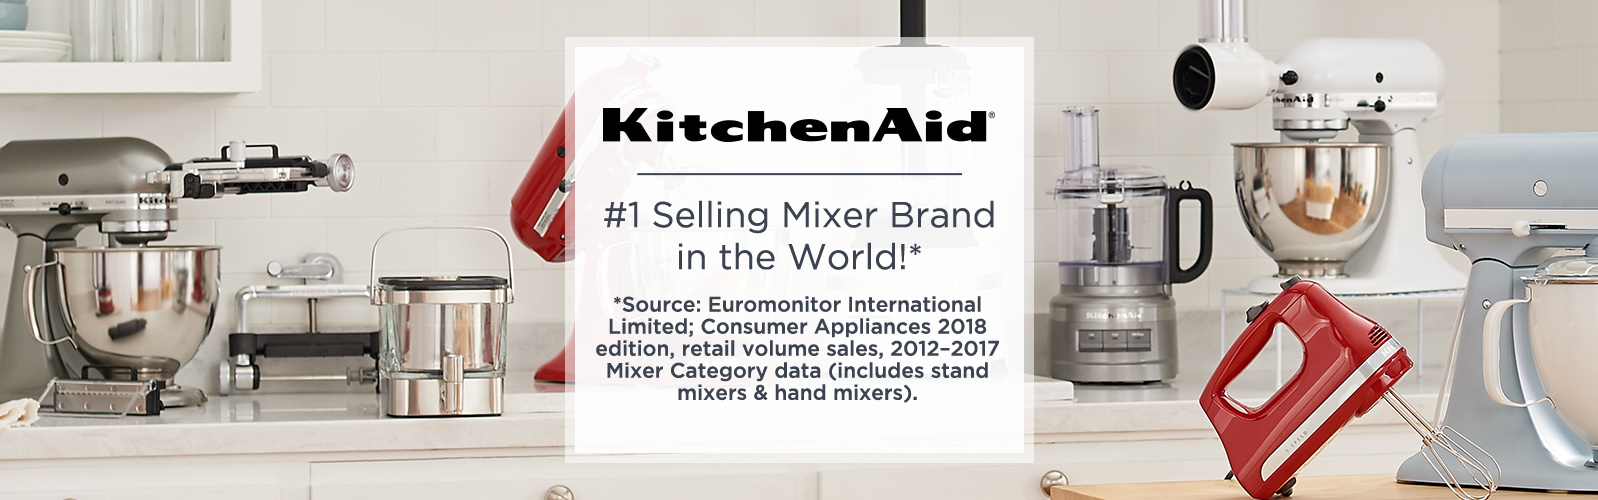 Kitchenaid 1 Ing Mixer Brand In The World